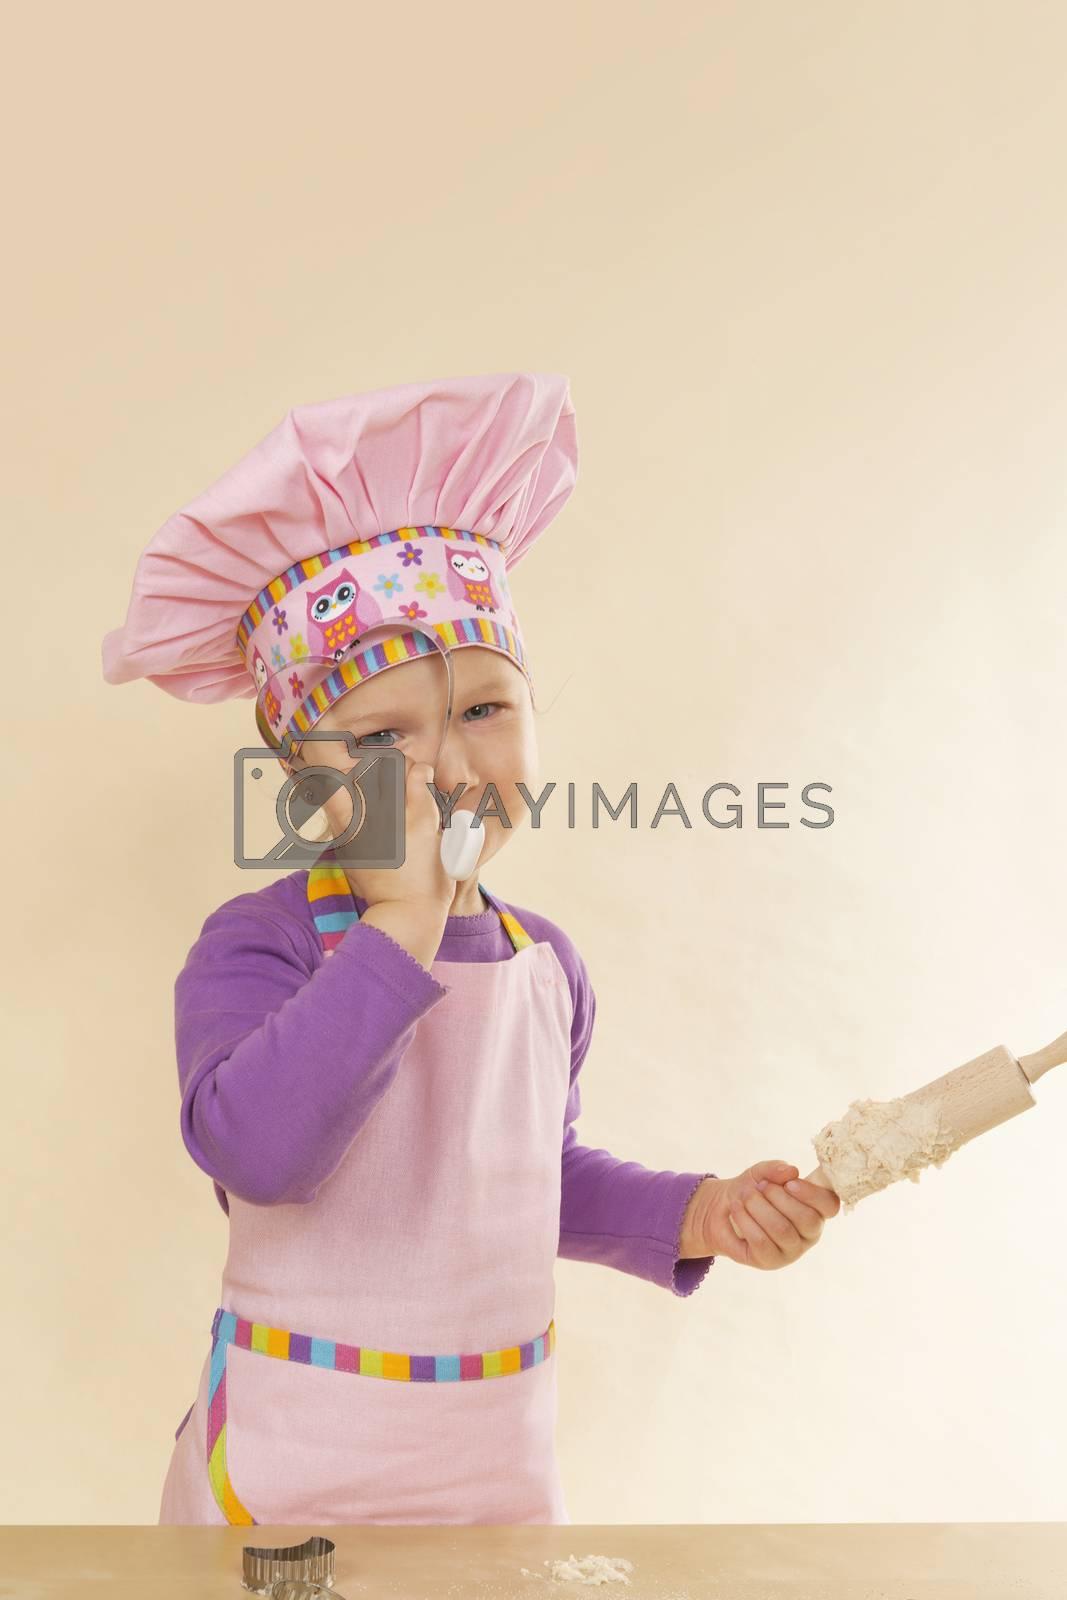 Cute little girl baking.